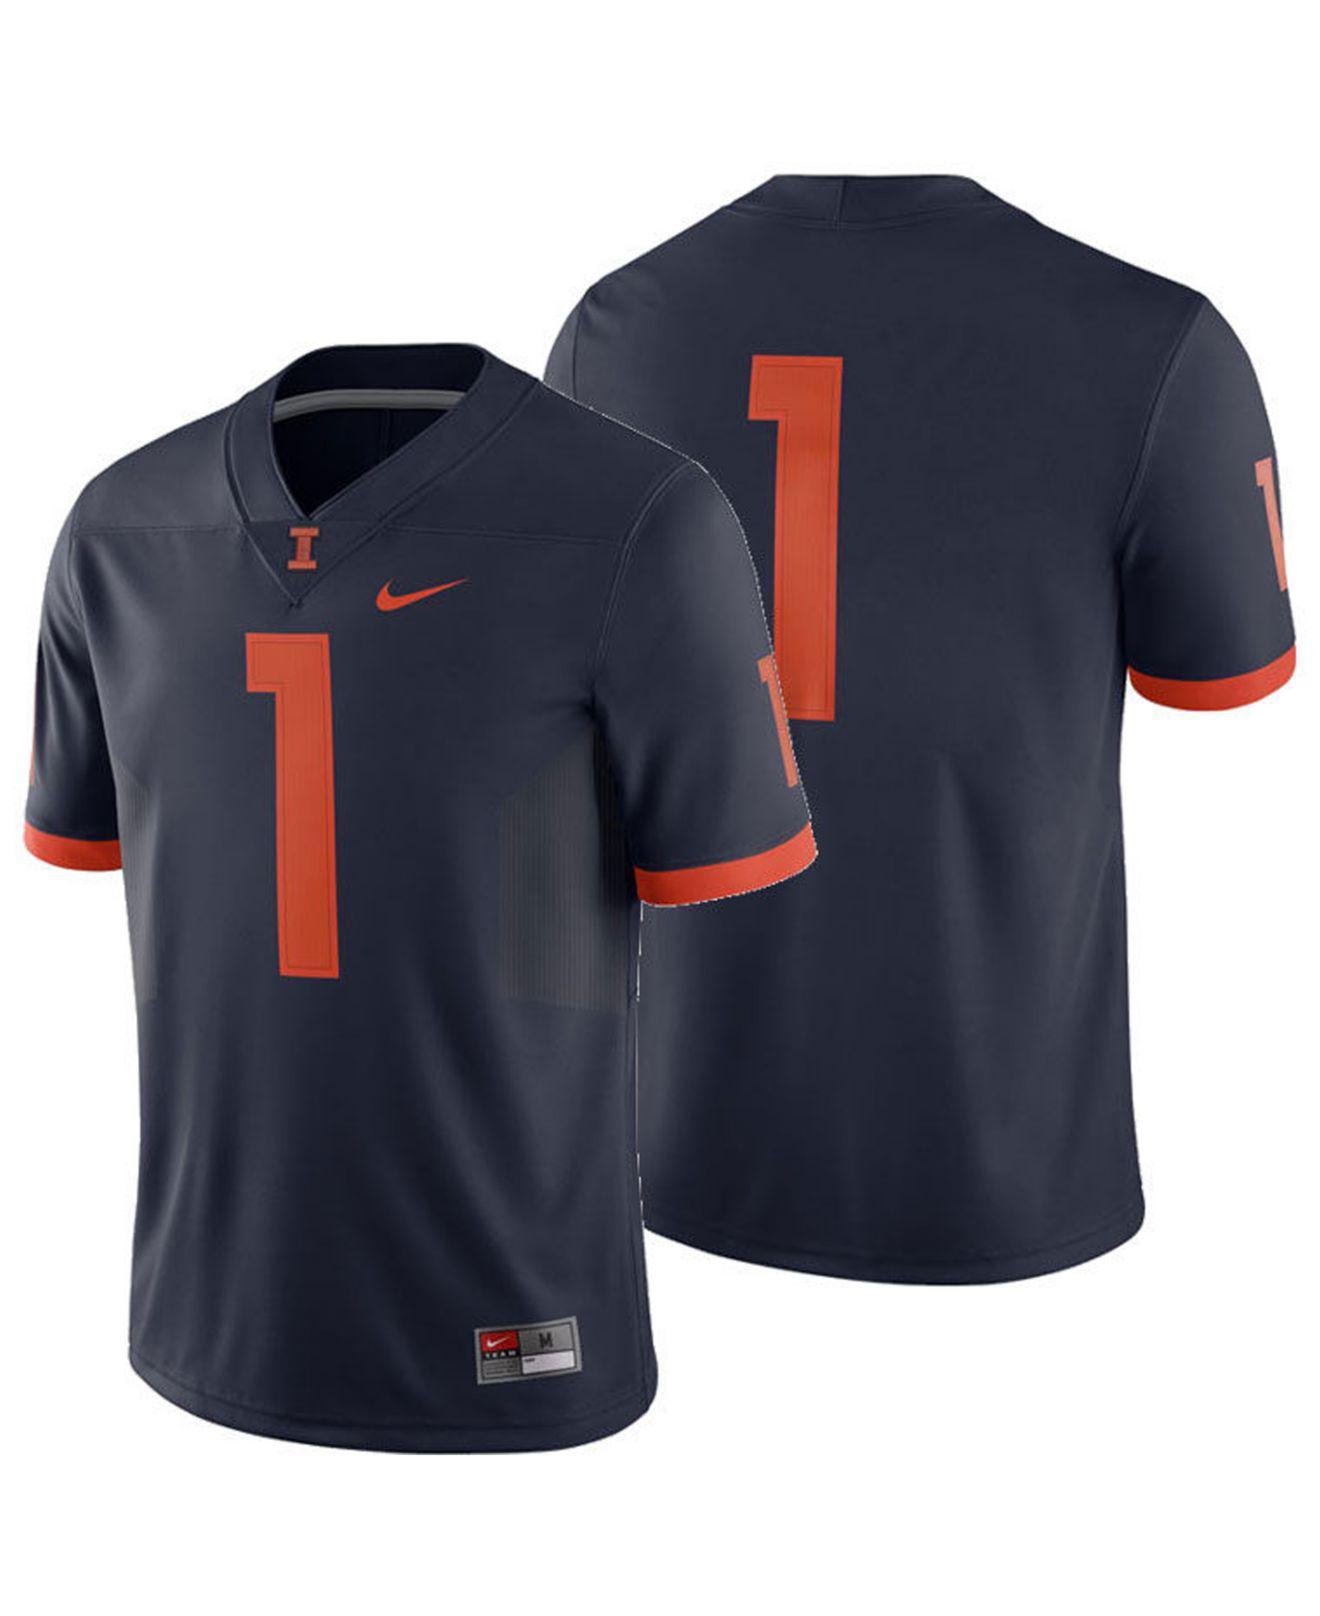 dfd253a5295 Lyst - Nike Illinois Fighting Illini Football Replica Game Jersey in ...